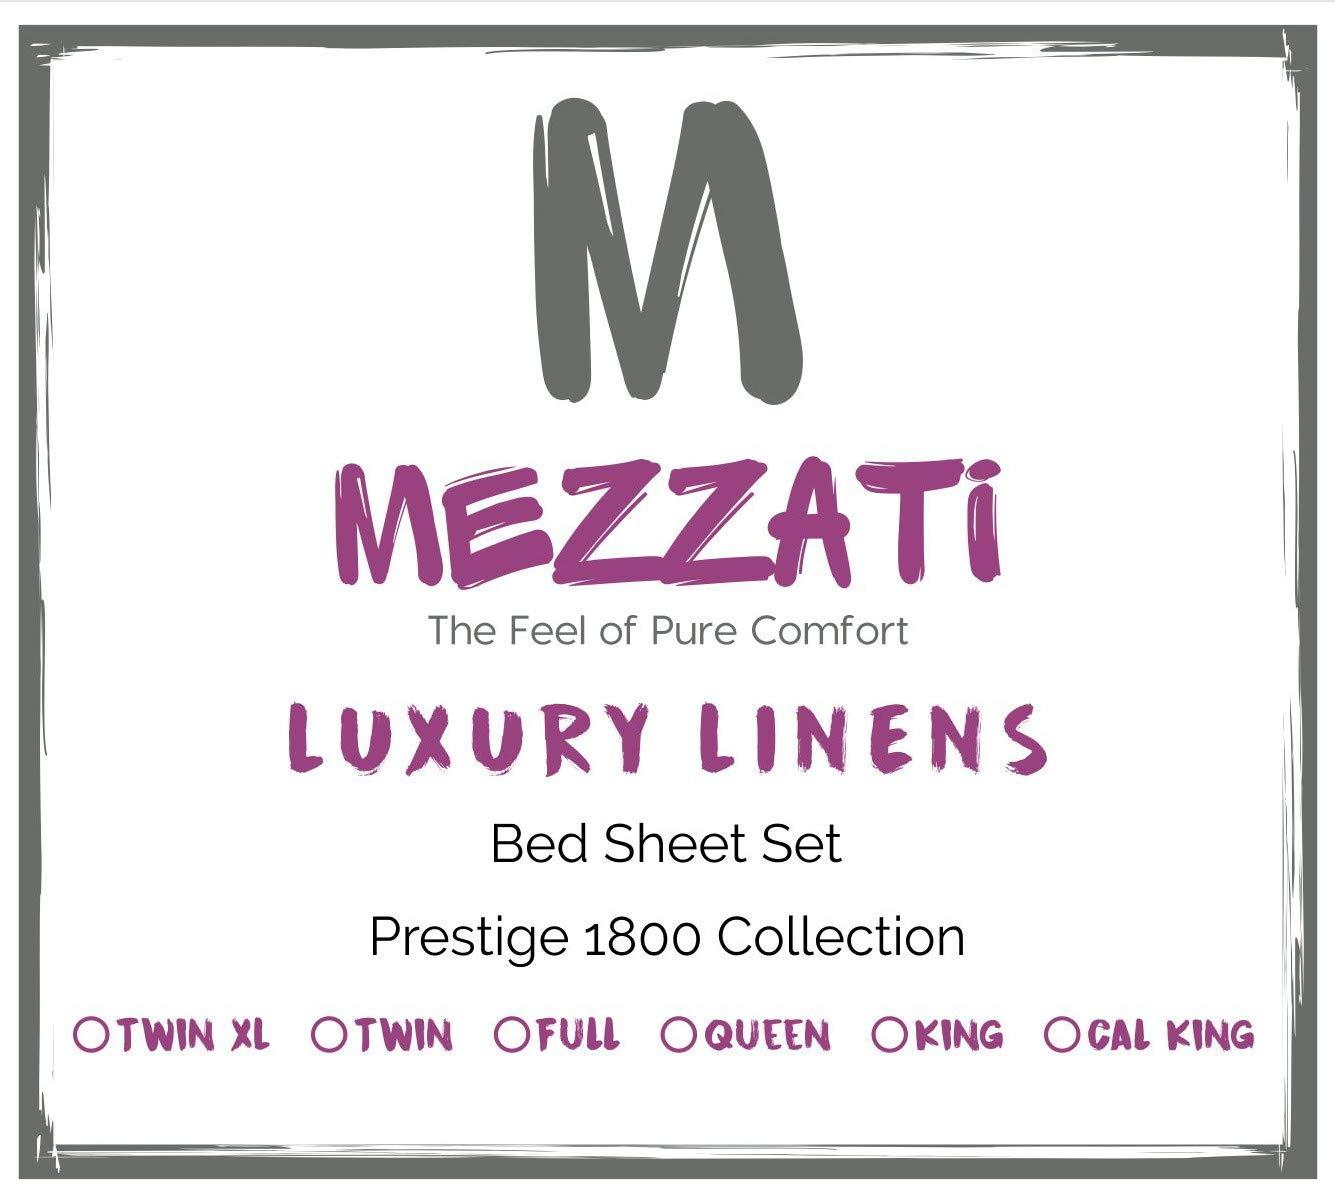 Mezzati Luxury Bed Sheet Set - Soft Comfortable 1800 Prestige Collection - Brushed Microfiber Bedding (Pink, Full Size)